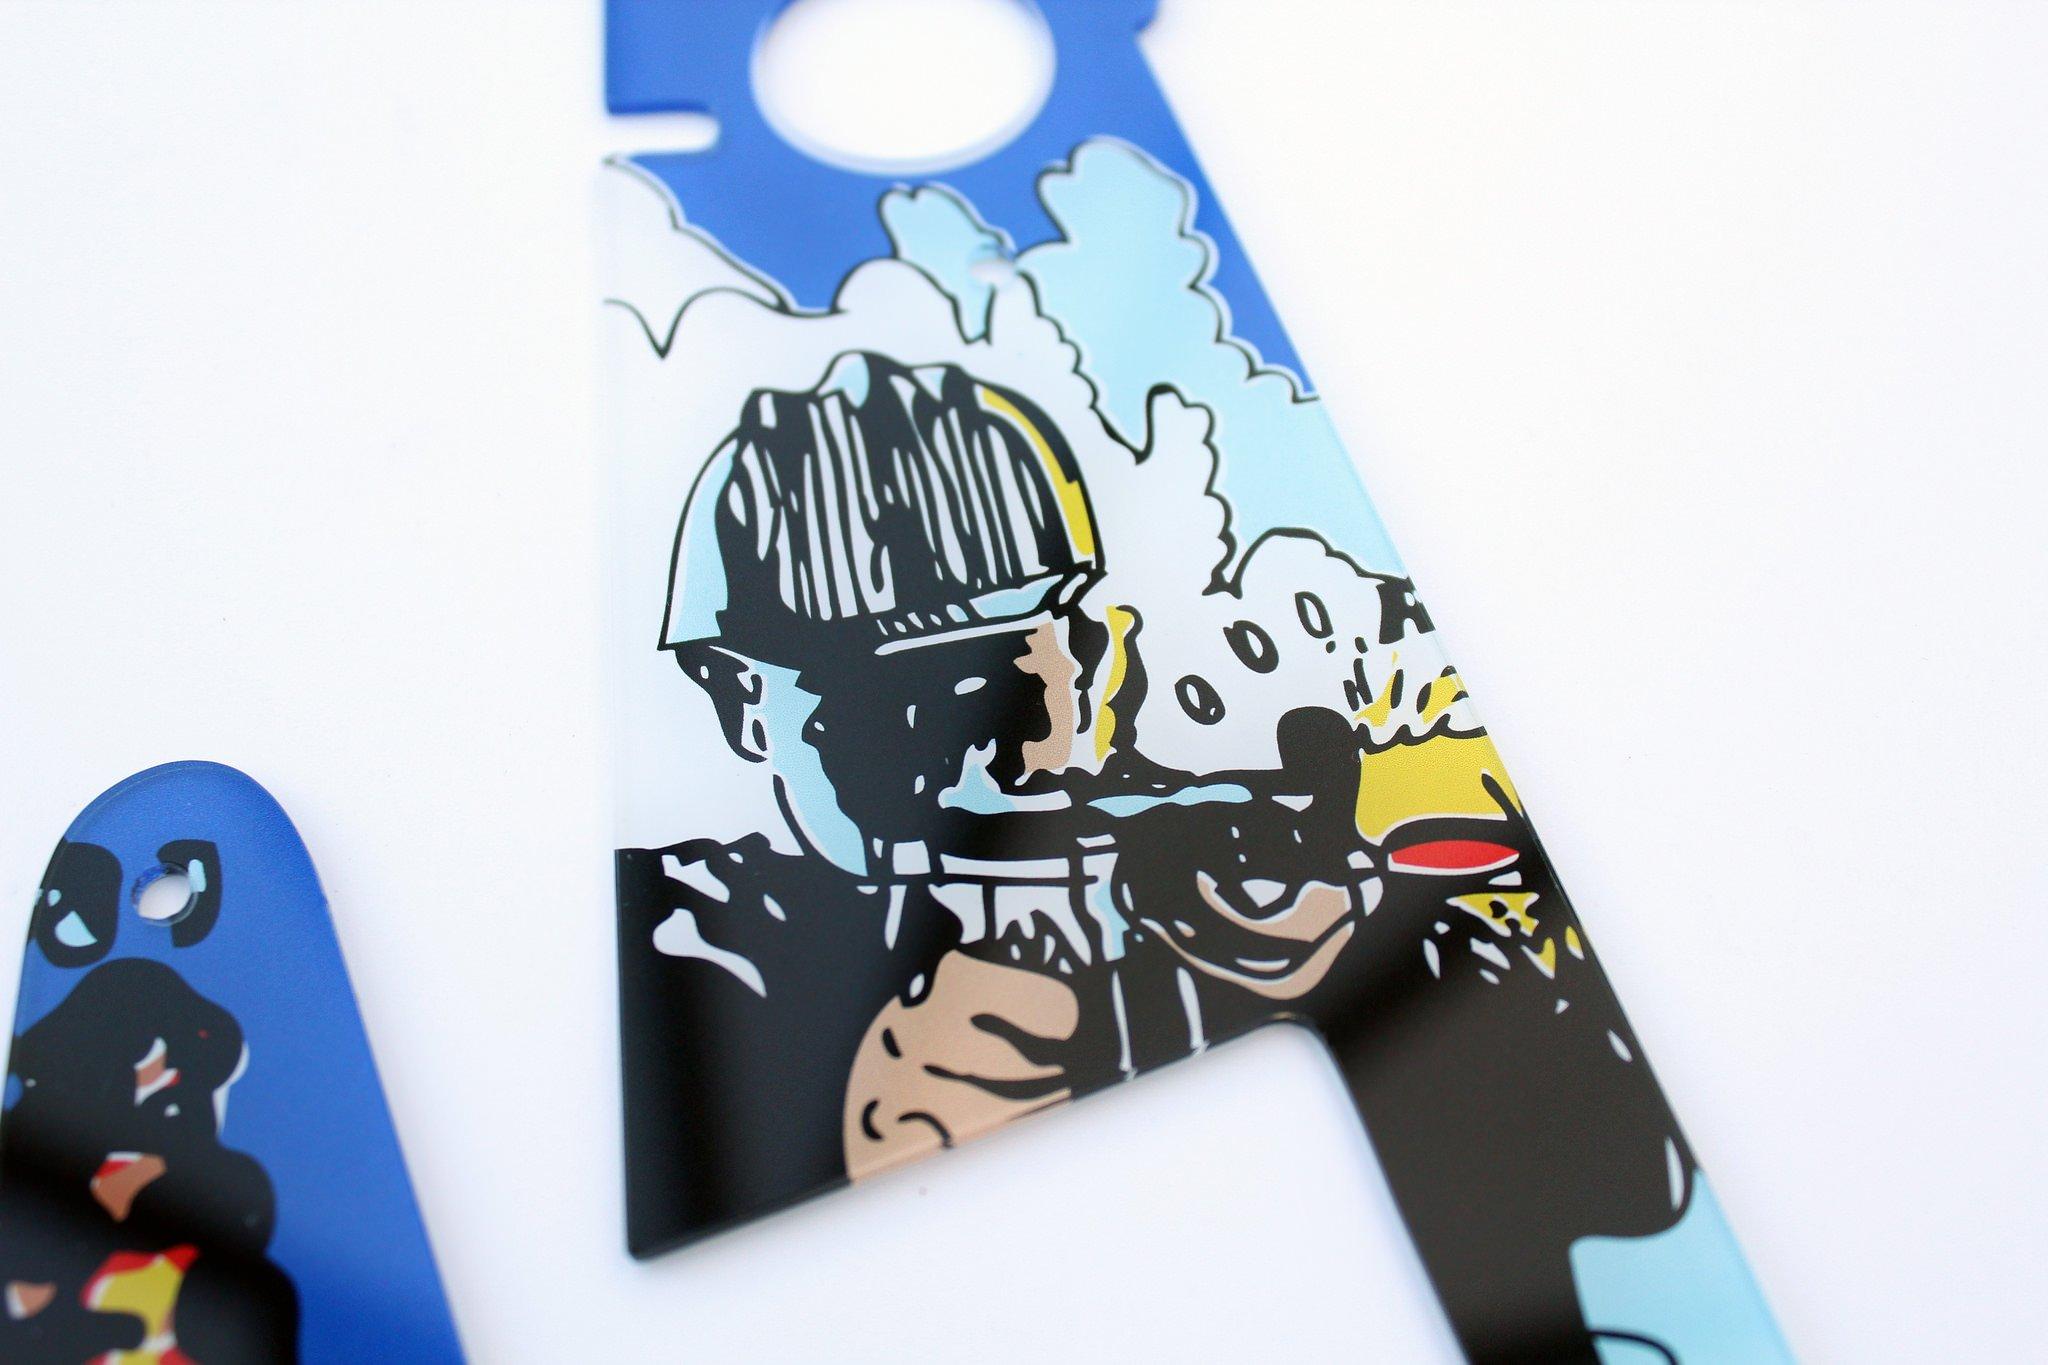 Lethal Weapon 3 Flipper Pinball Plastics Mini Kit 4